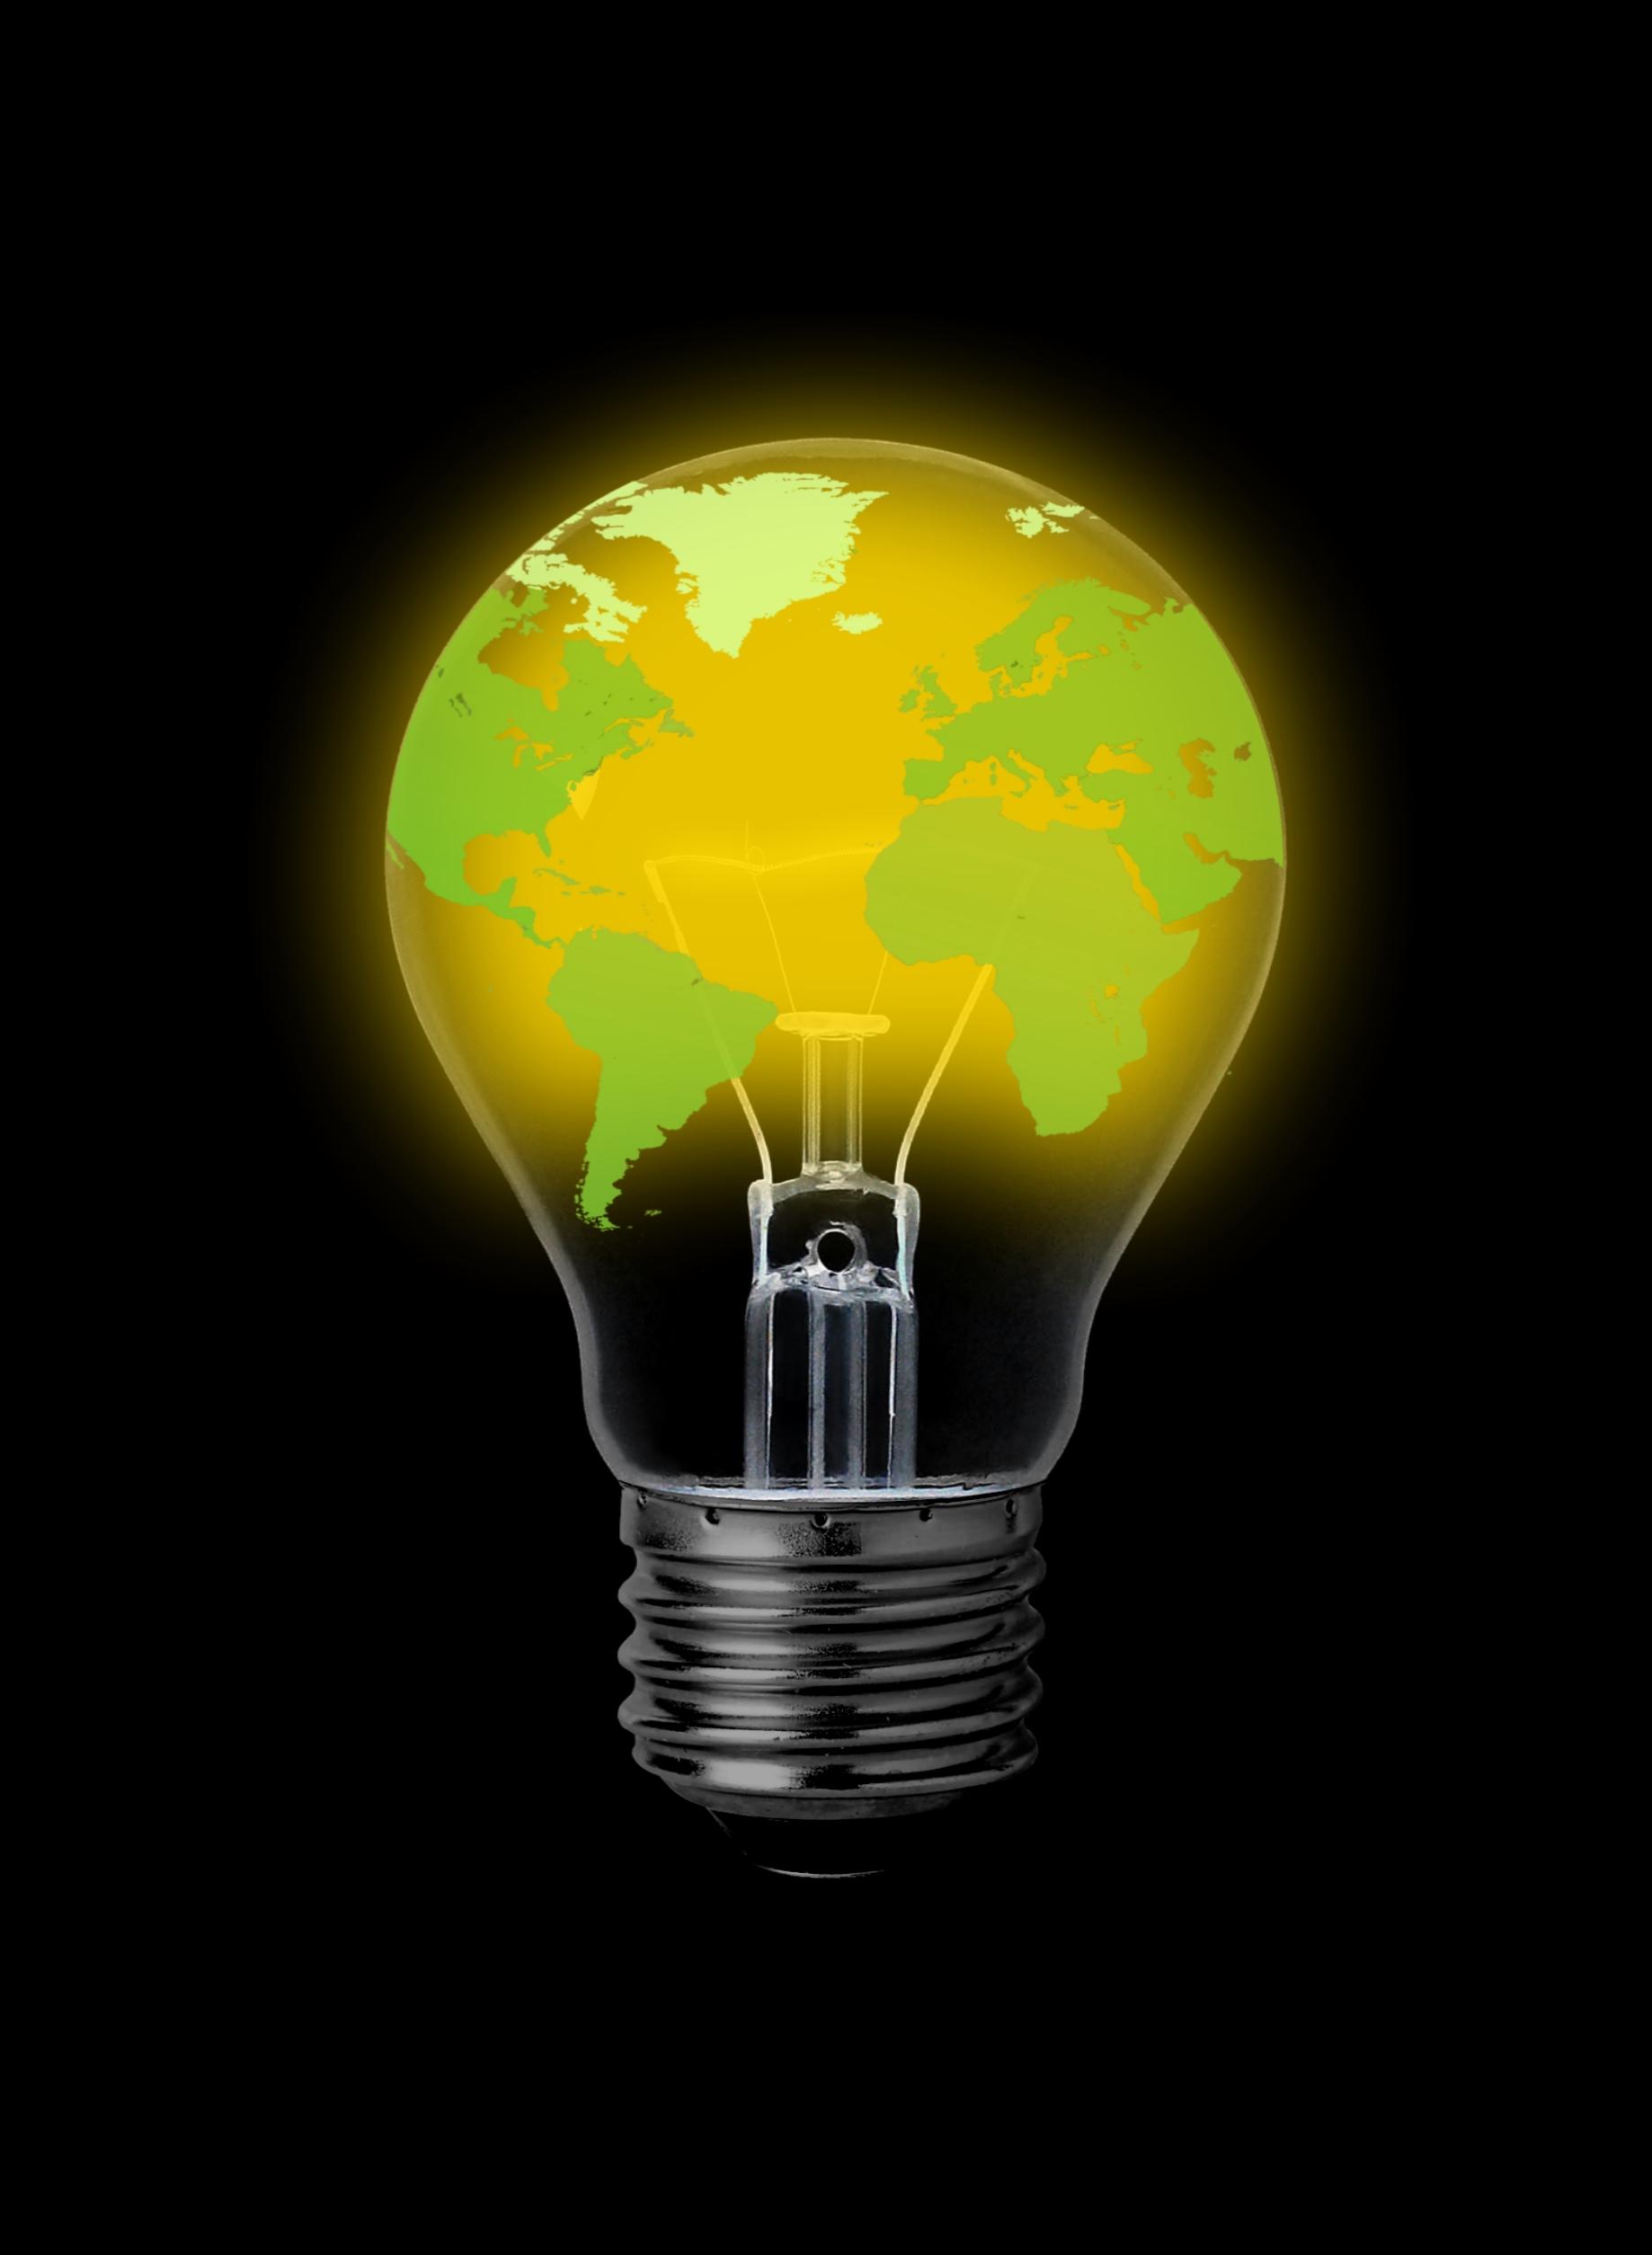 https://depositphotos.com/3973227/stock-photo-lightbulb-with-world-map.html